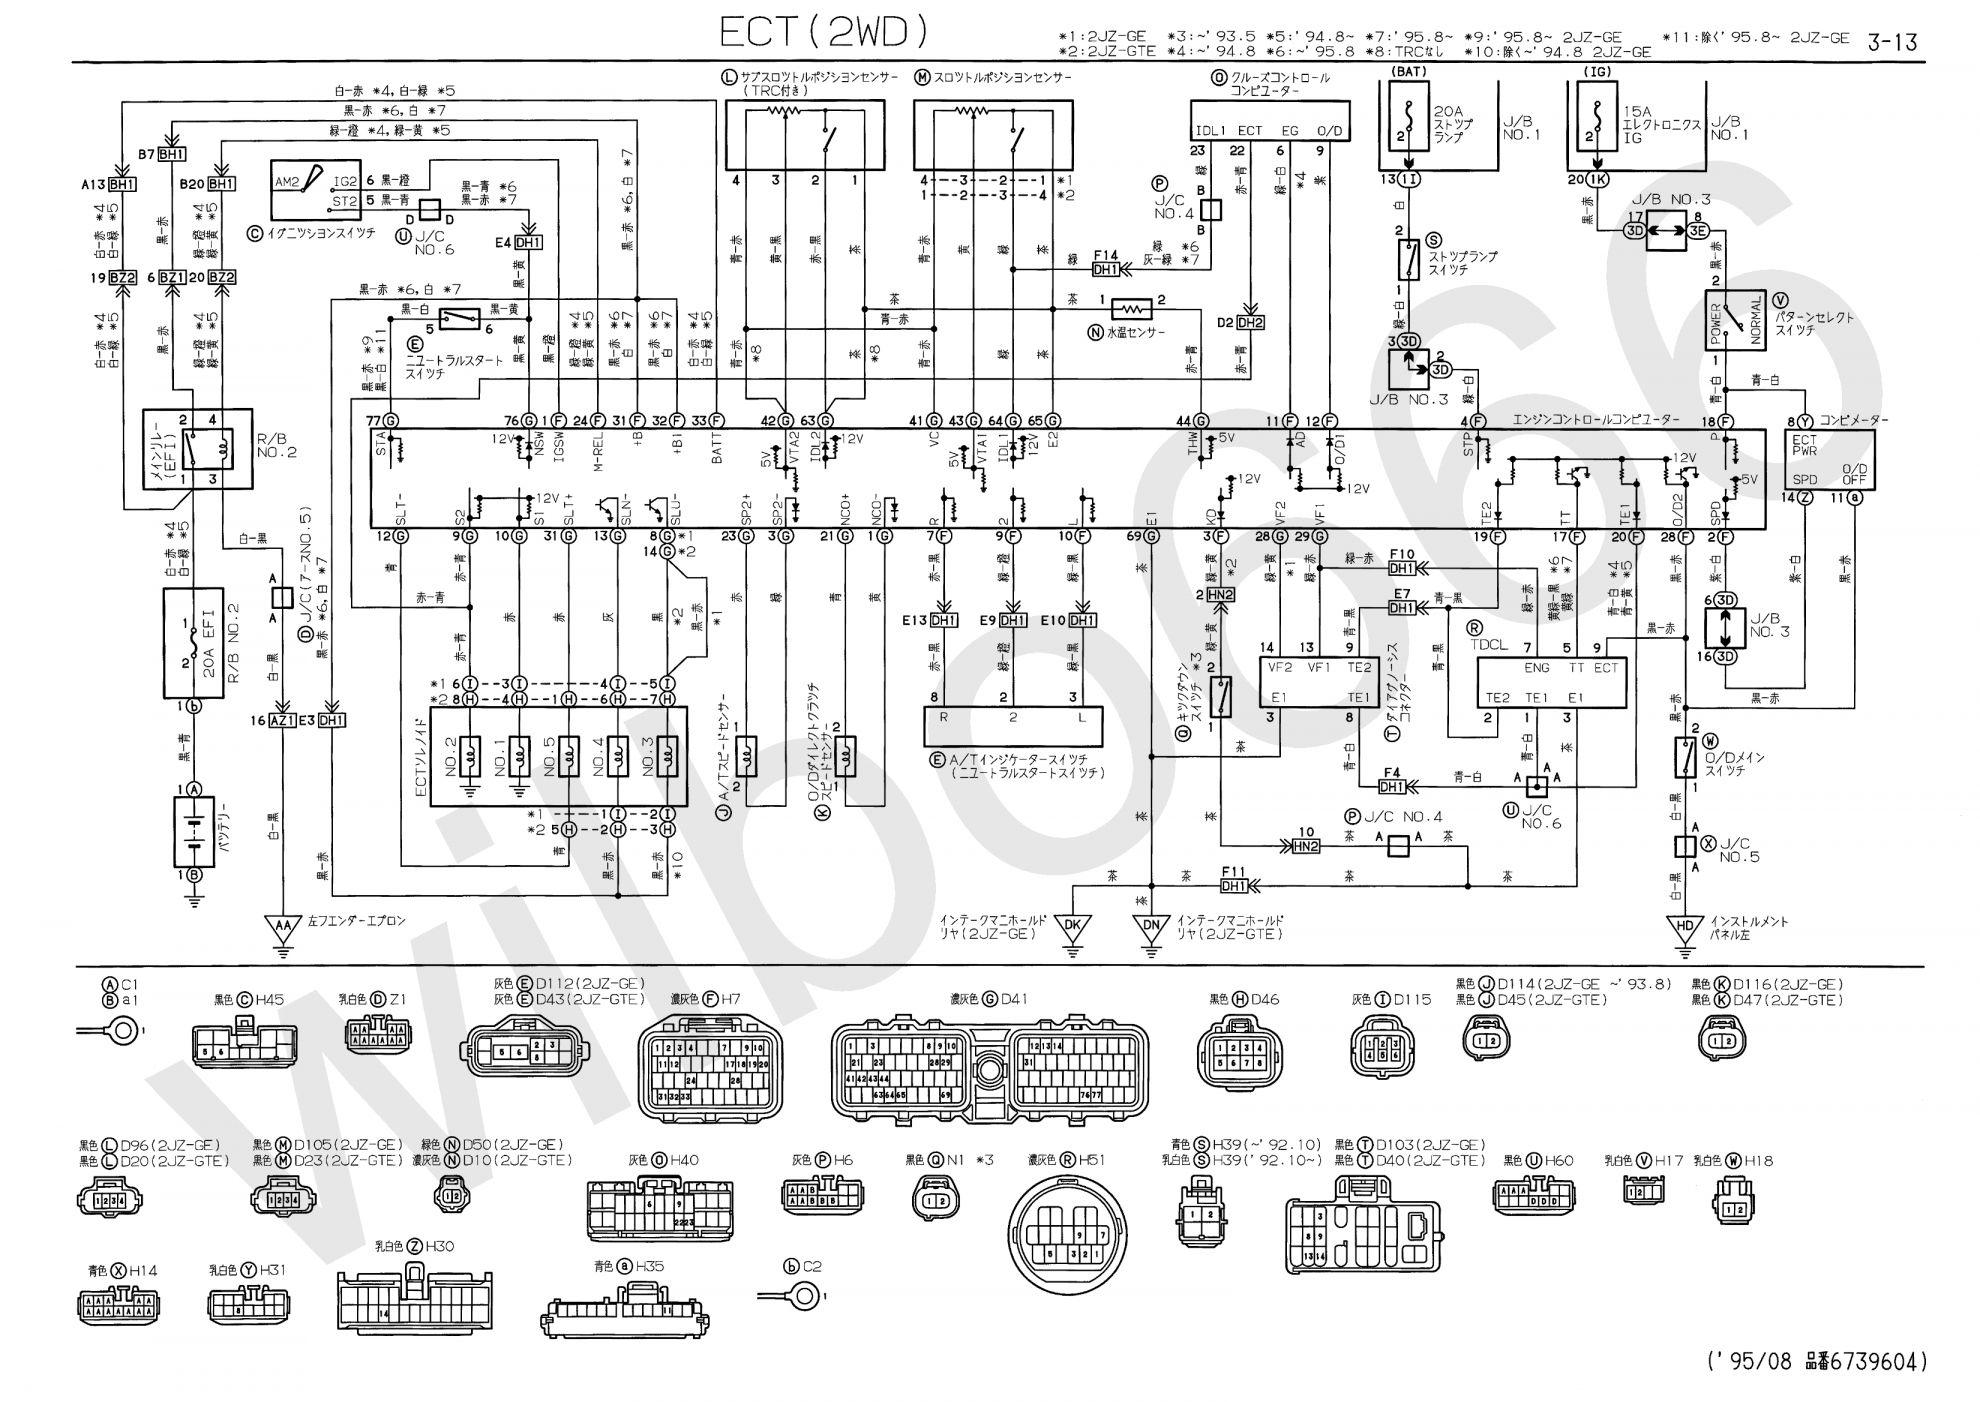 12 2jzgte Engine Wiring Diagram Engine Diagram Wiringg Net Electrical Wiring Diagram Electrical Diagram Diagram